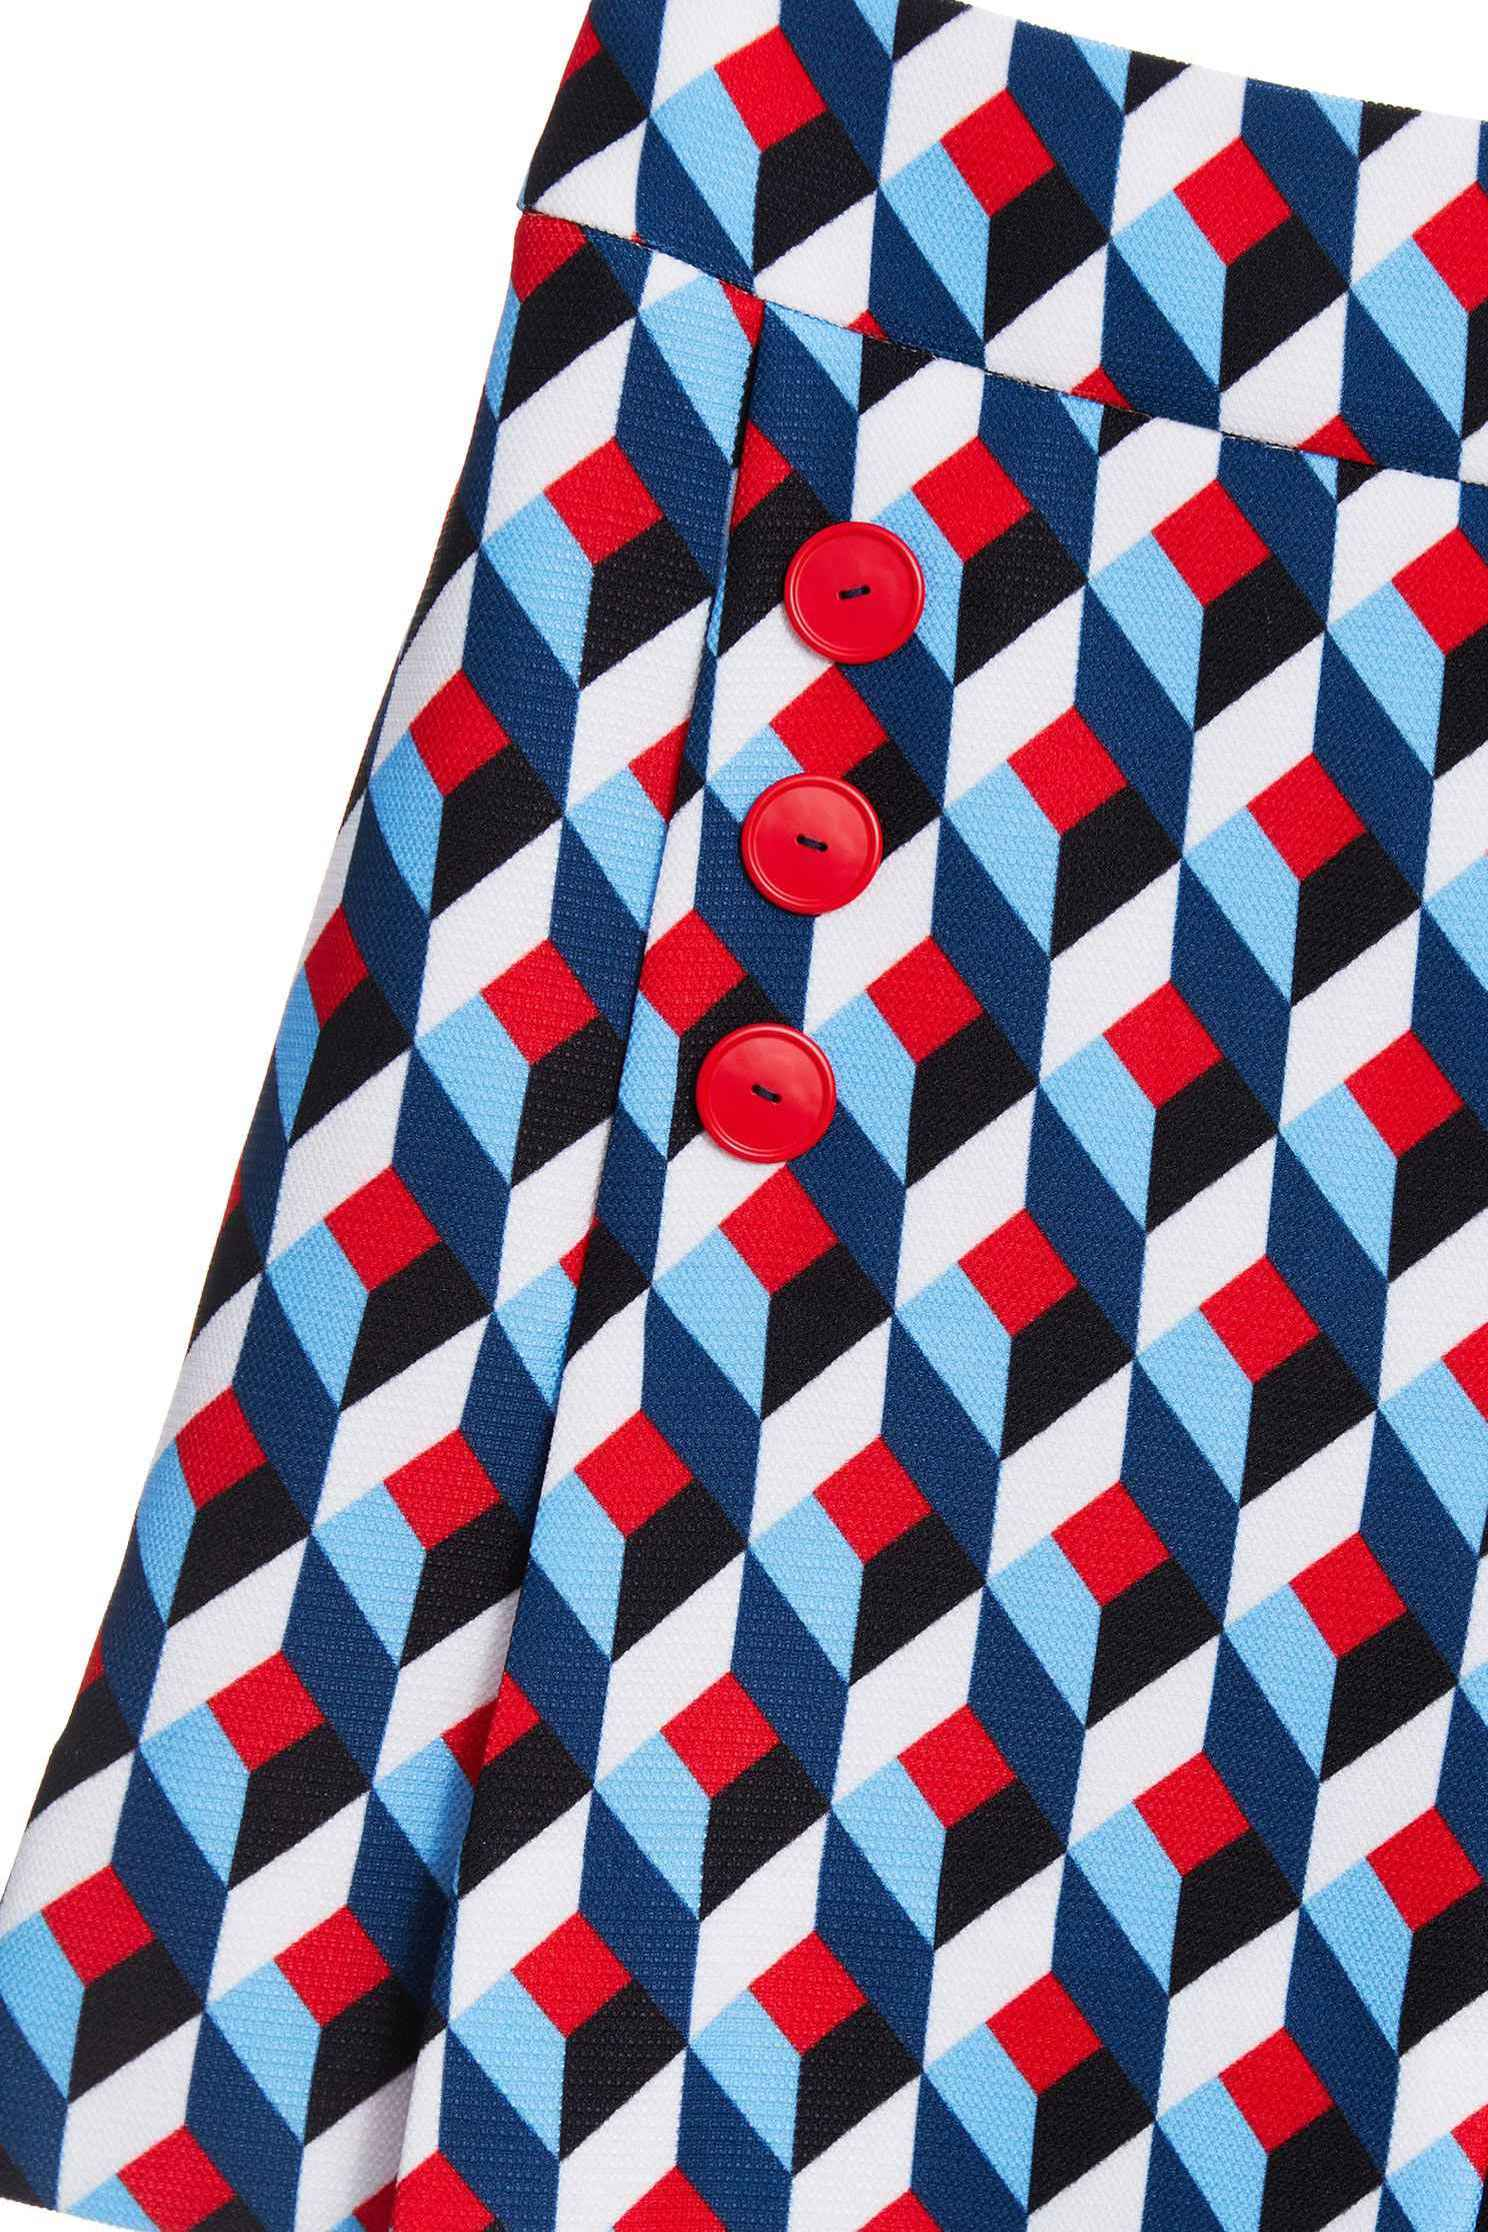 Geometric print skirt,miniskirt,culottes